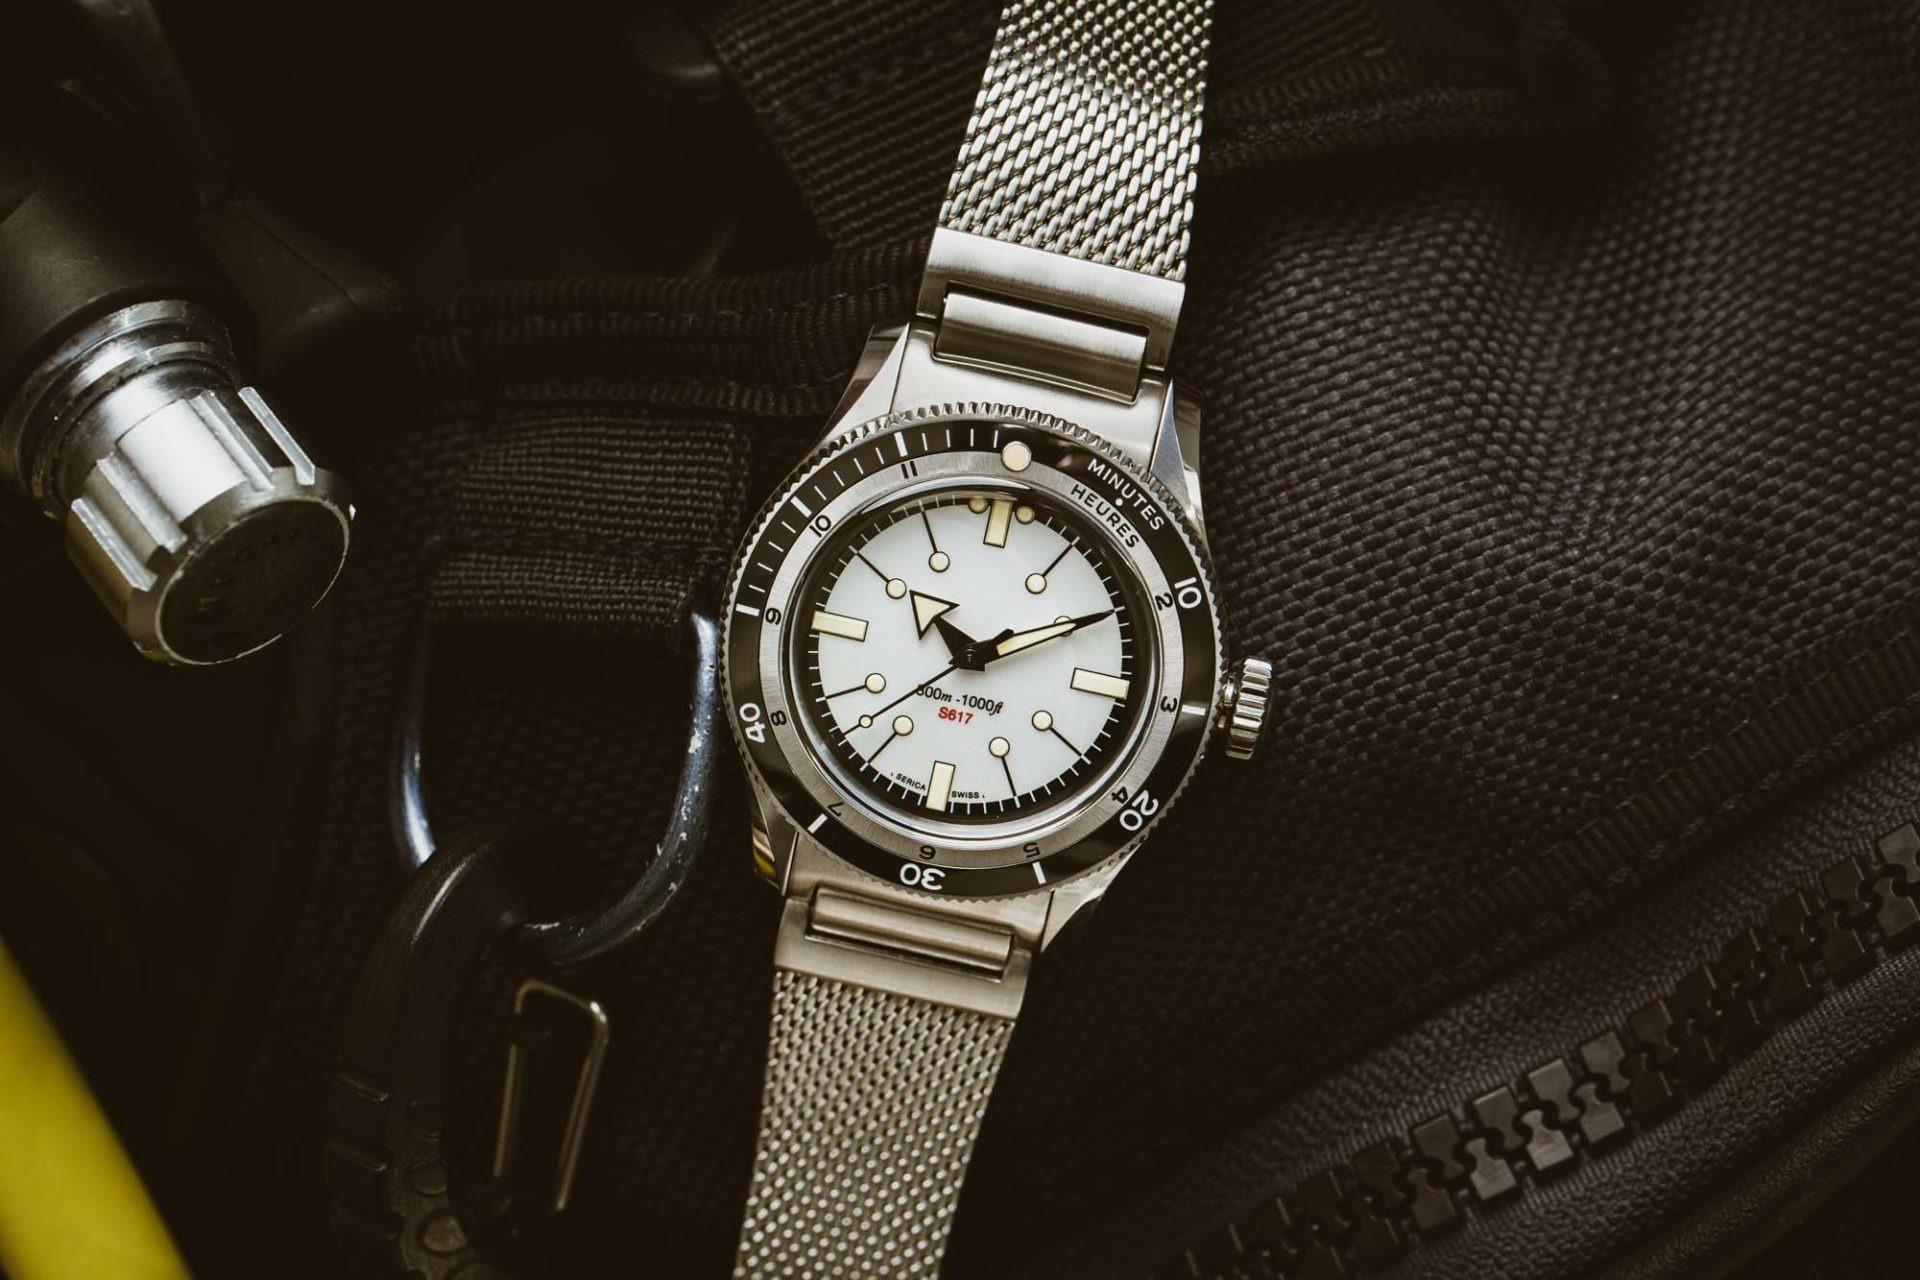 Serica 5303 - La nouvelle montre de plongée Serica